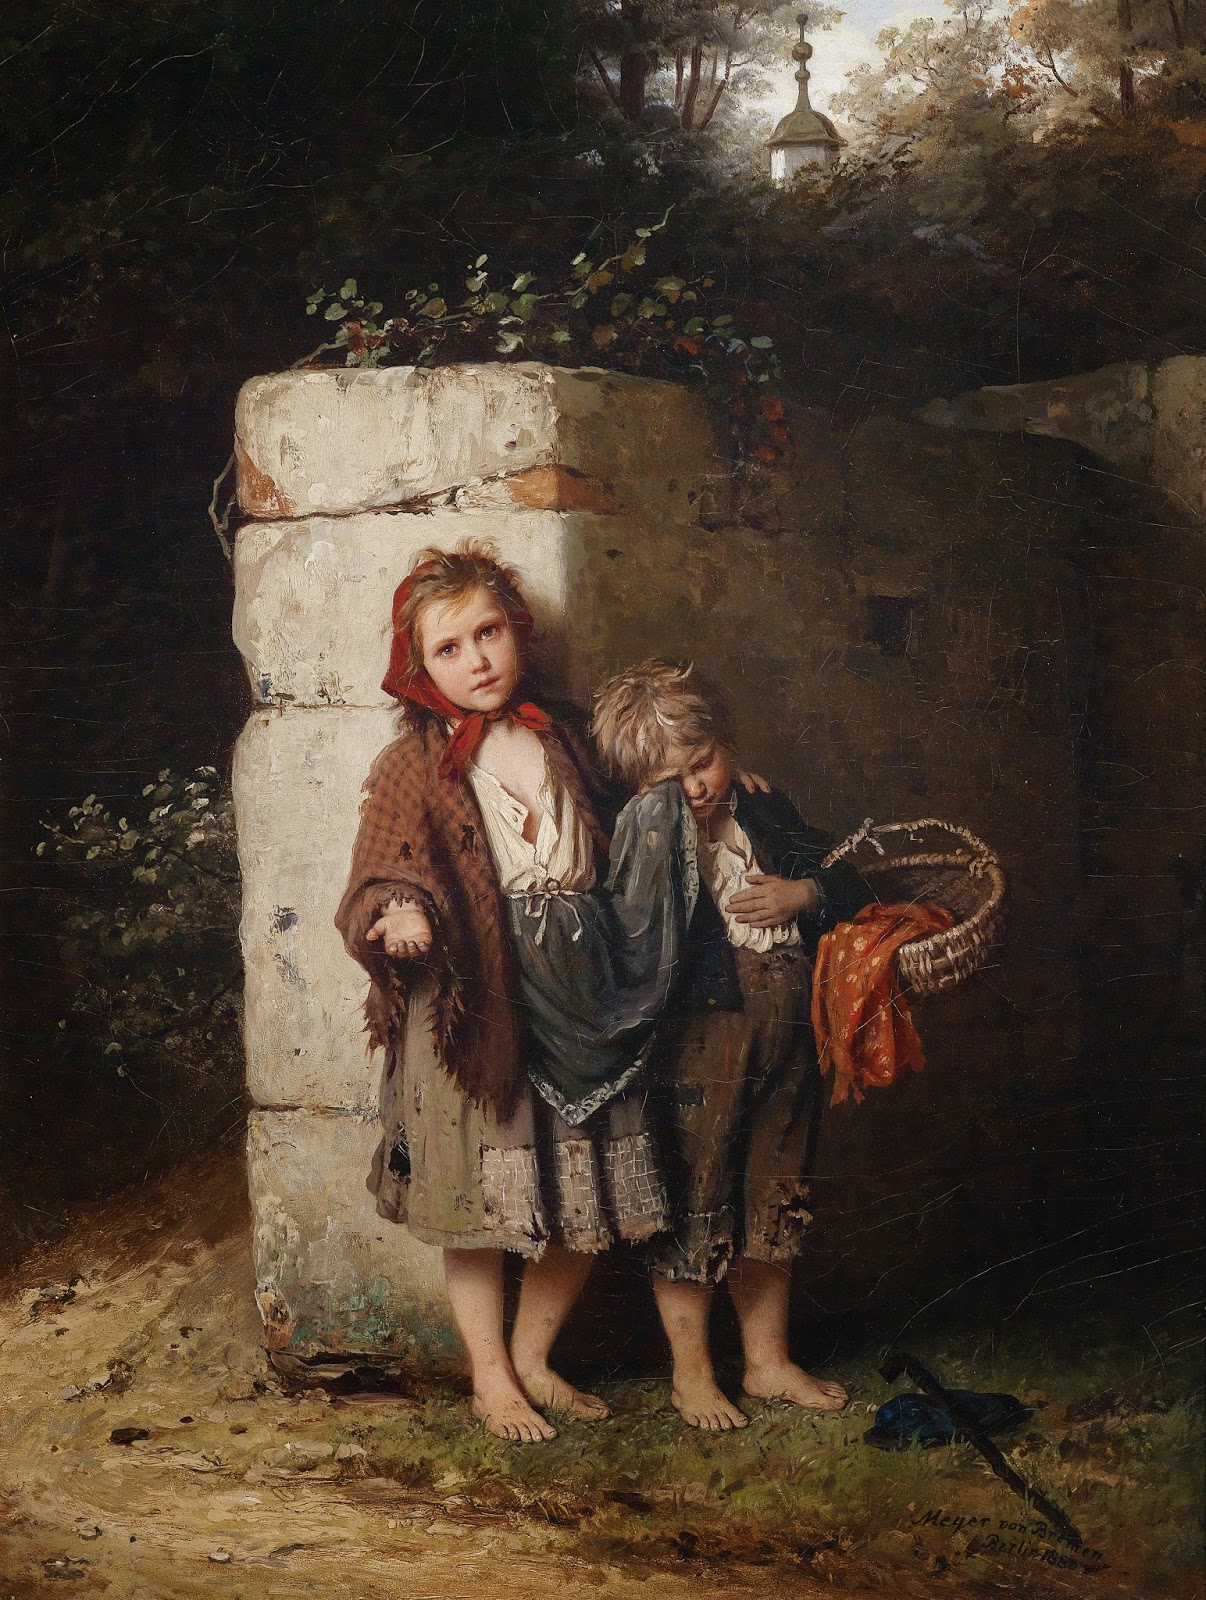 alenquerensis johann georg meyer von bremen pintor alem o 1813 1886 johann georg meyer. Black Bedroom Furniture Sets. Home Design Ideas